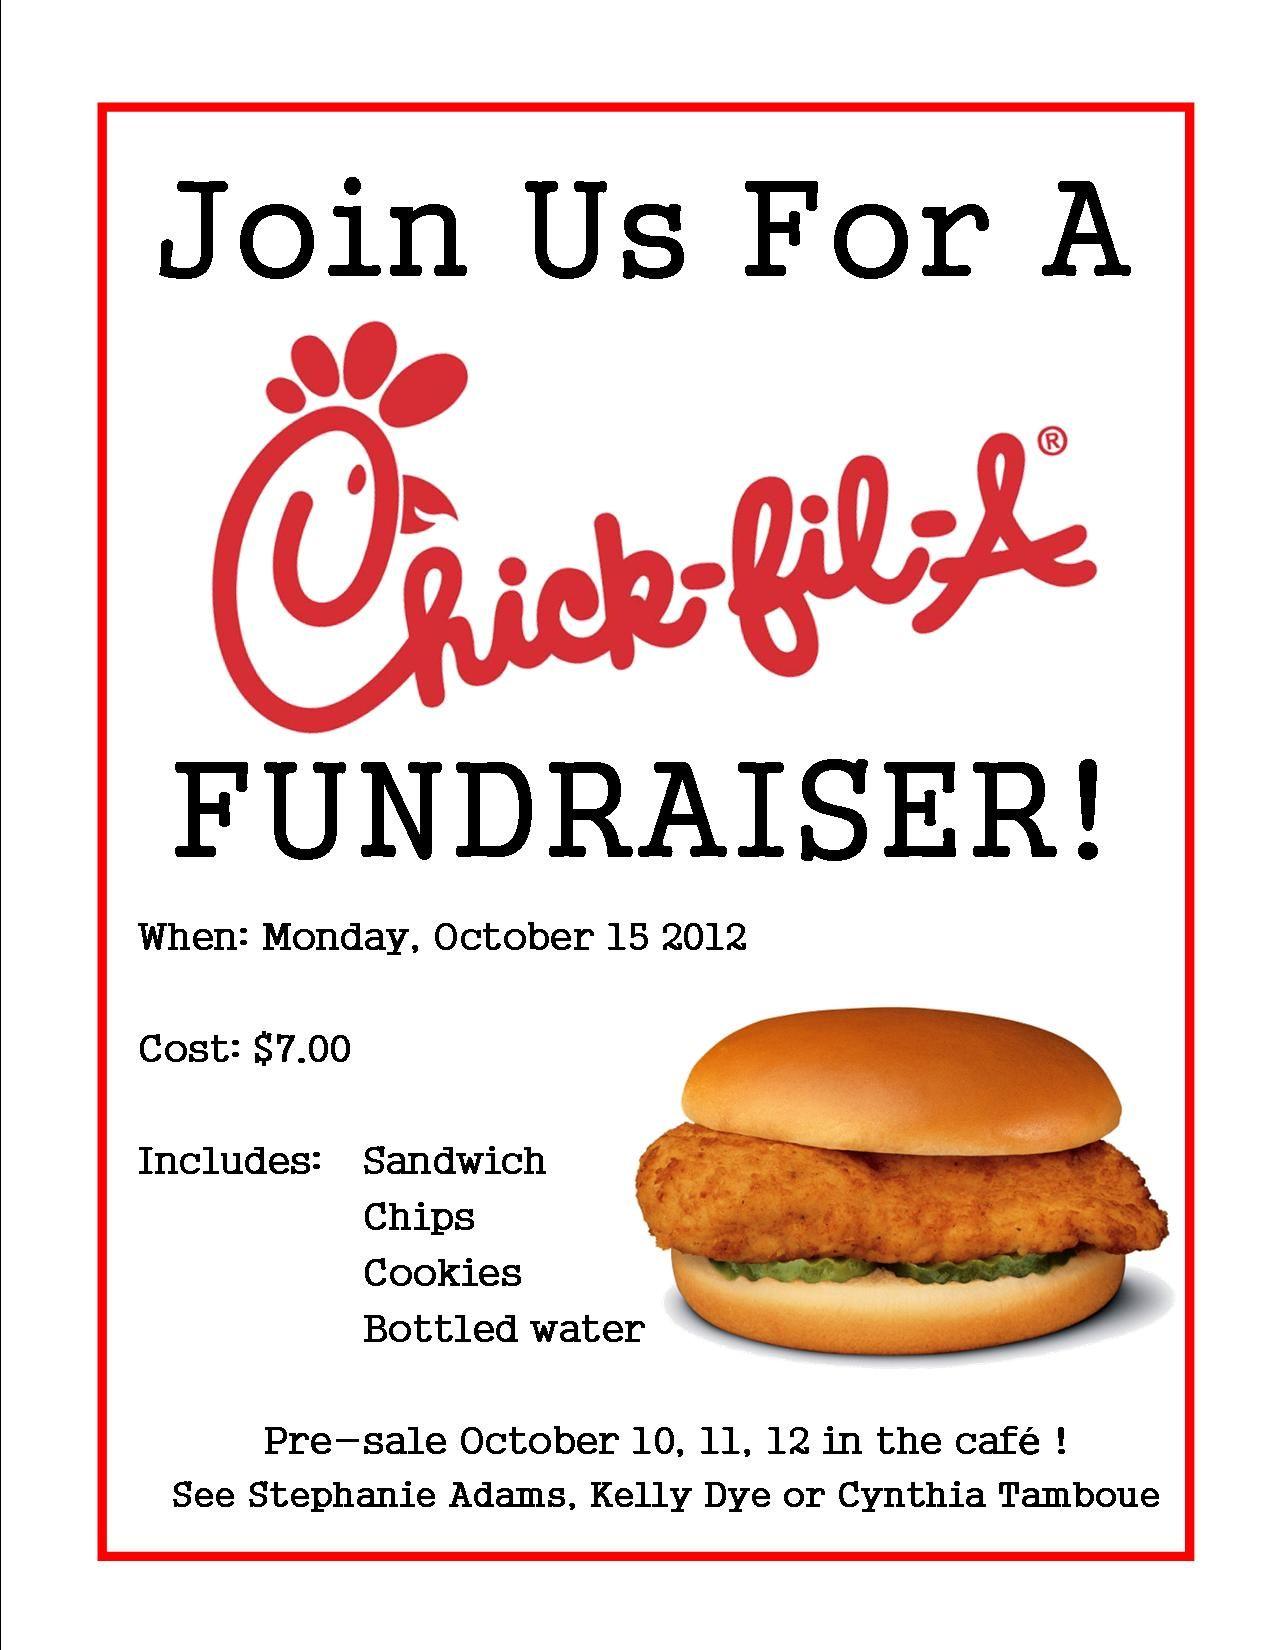 Chickfil a Fundraiser Flyer Chick fil a fundraiser